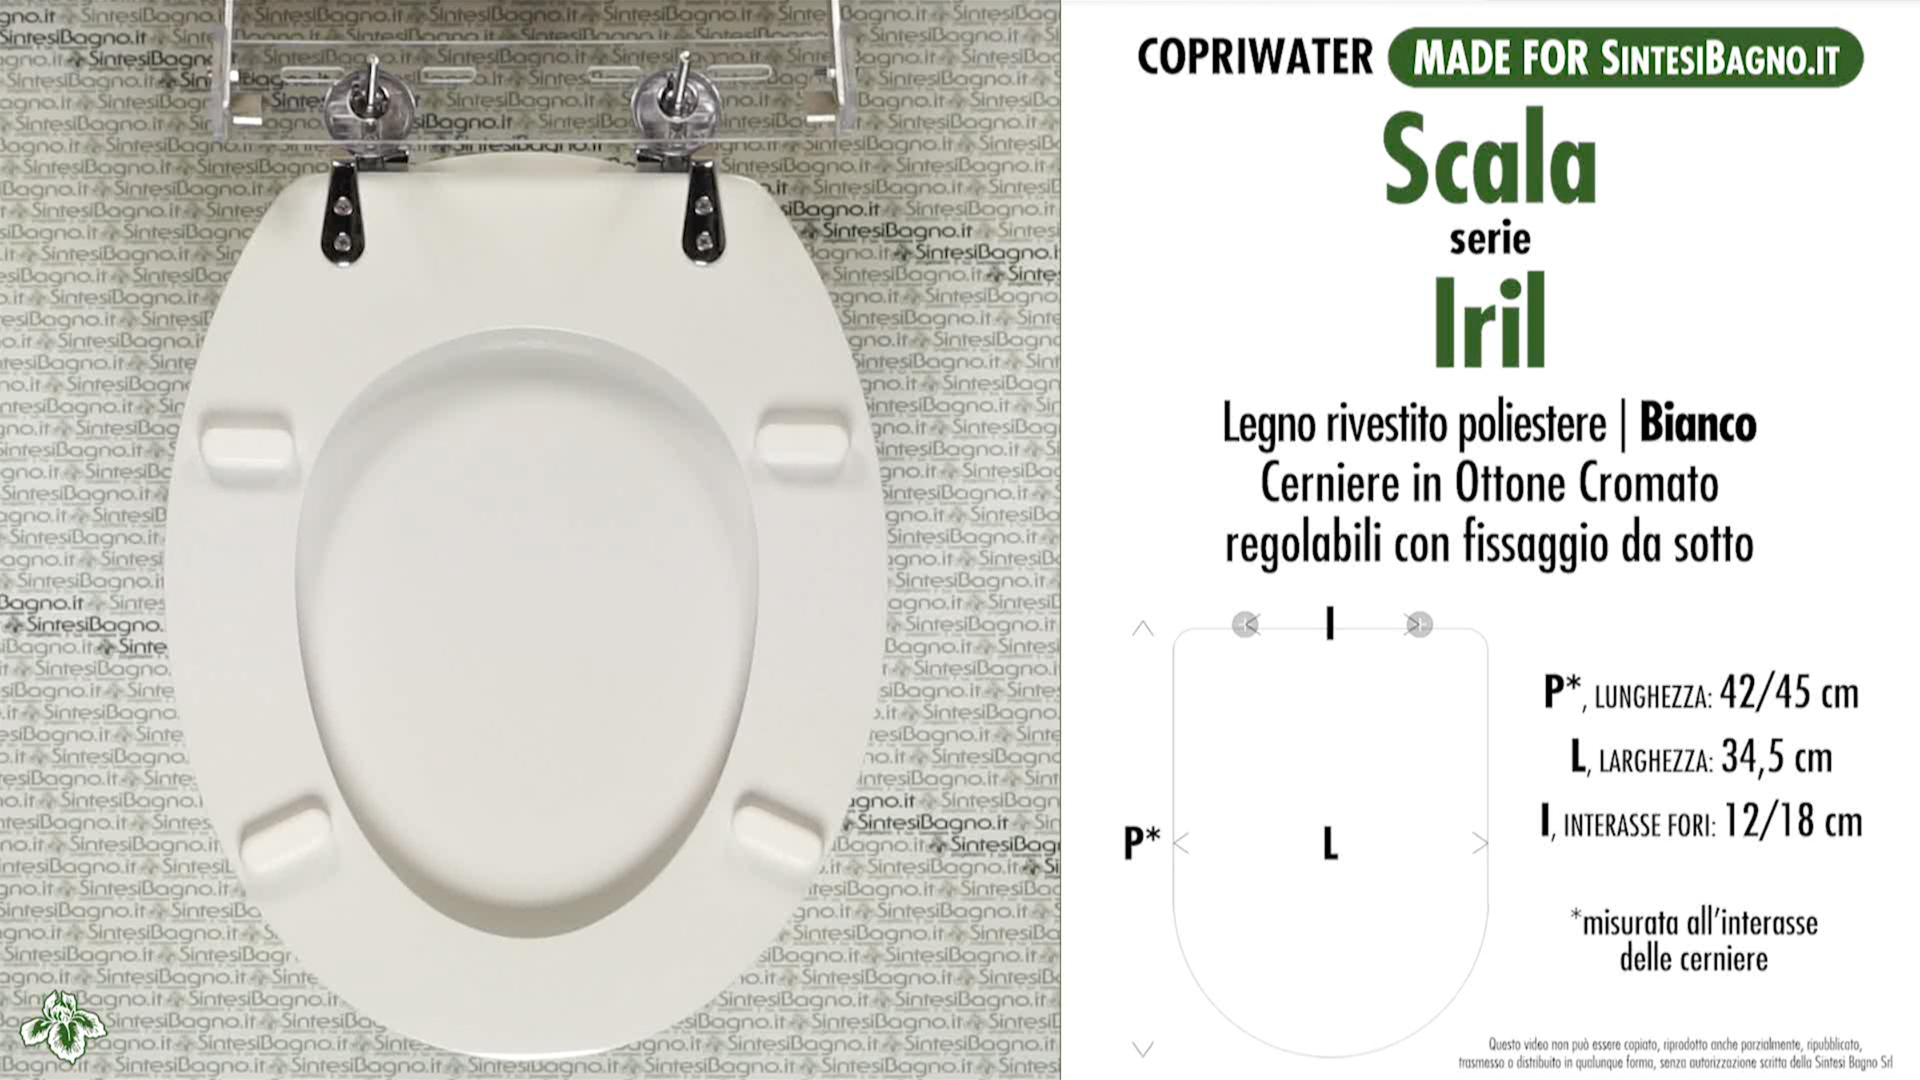 SCHEDA TECNICA MISURE copriwater SCALA IRIL